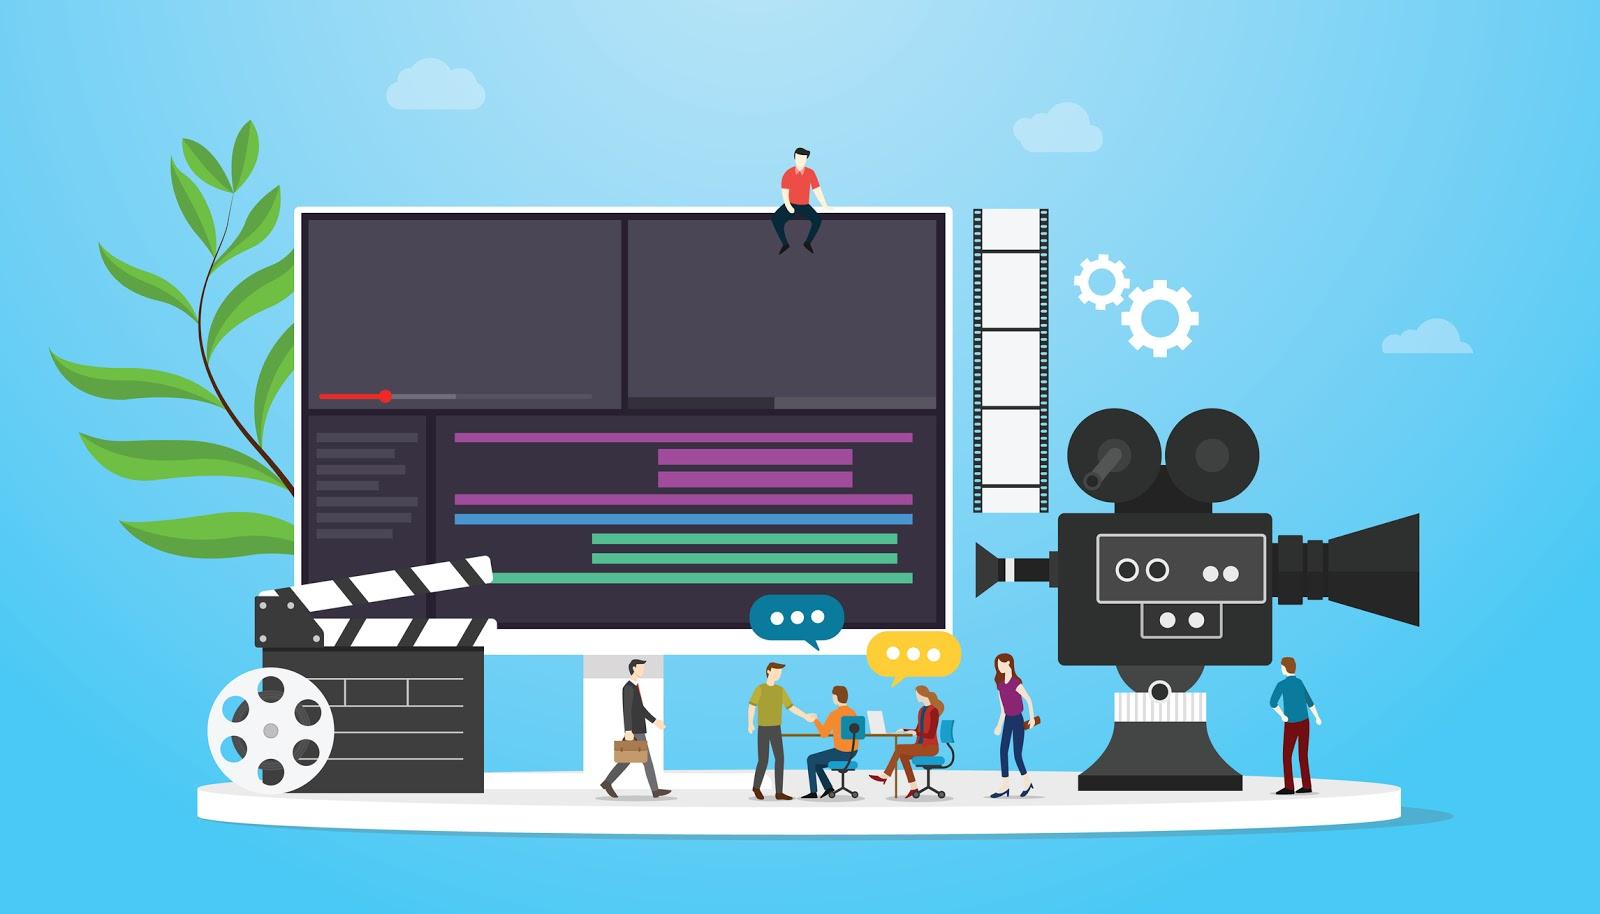 cartoon image of video production studio